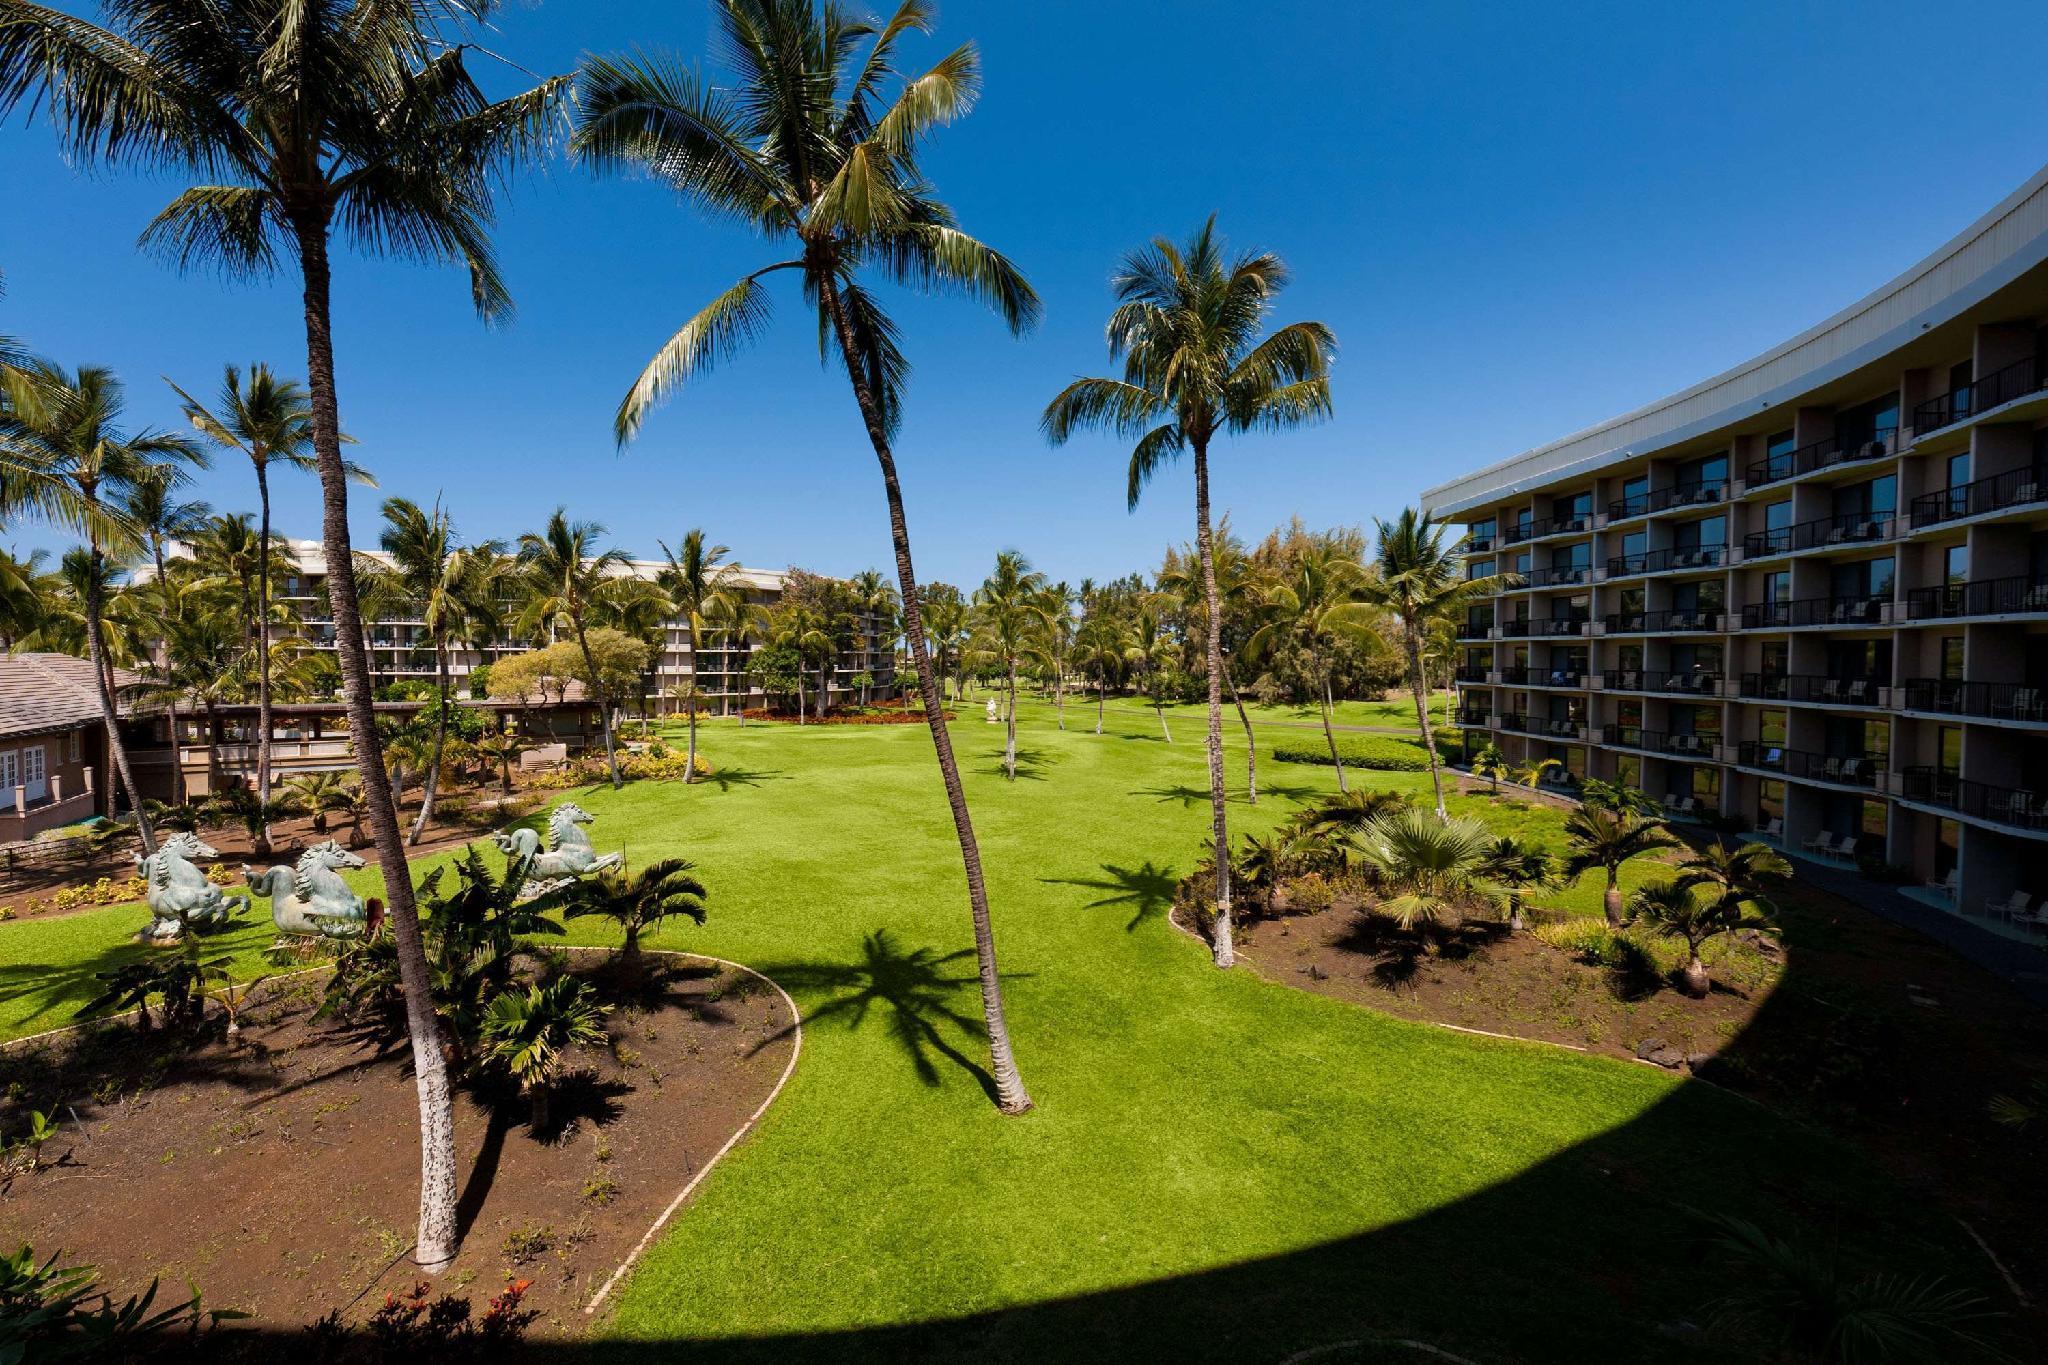 Hilton Waikoloa Village Hotel